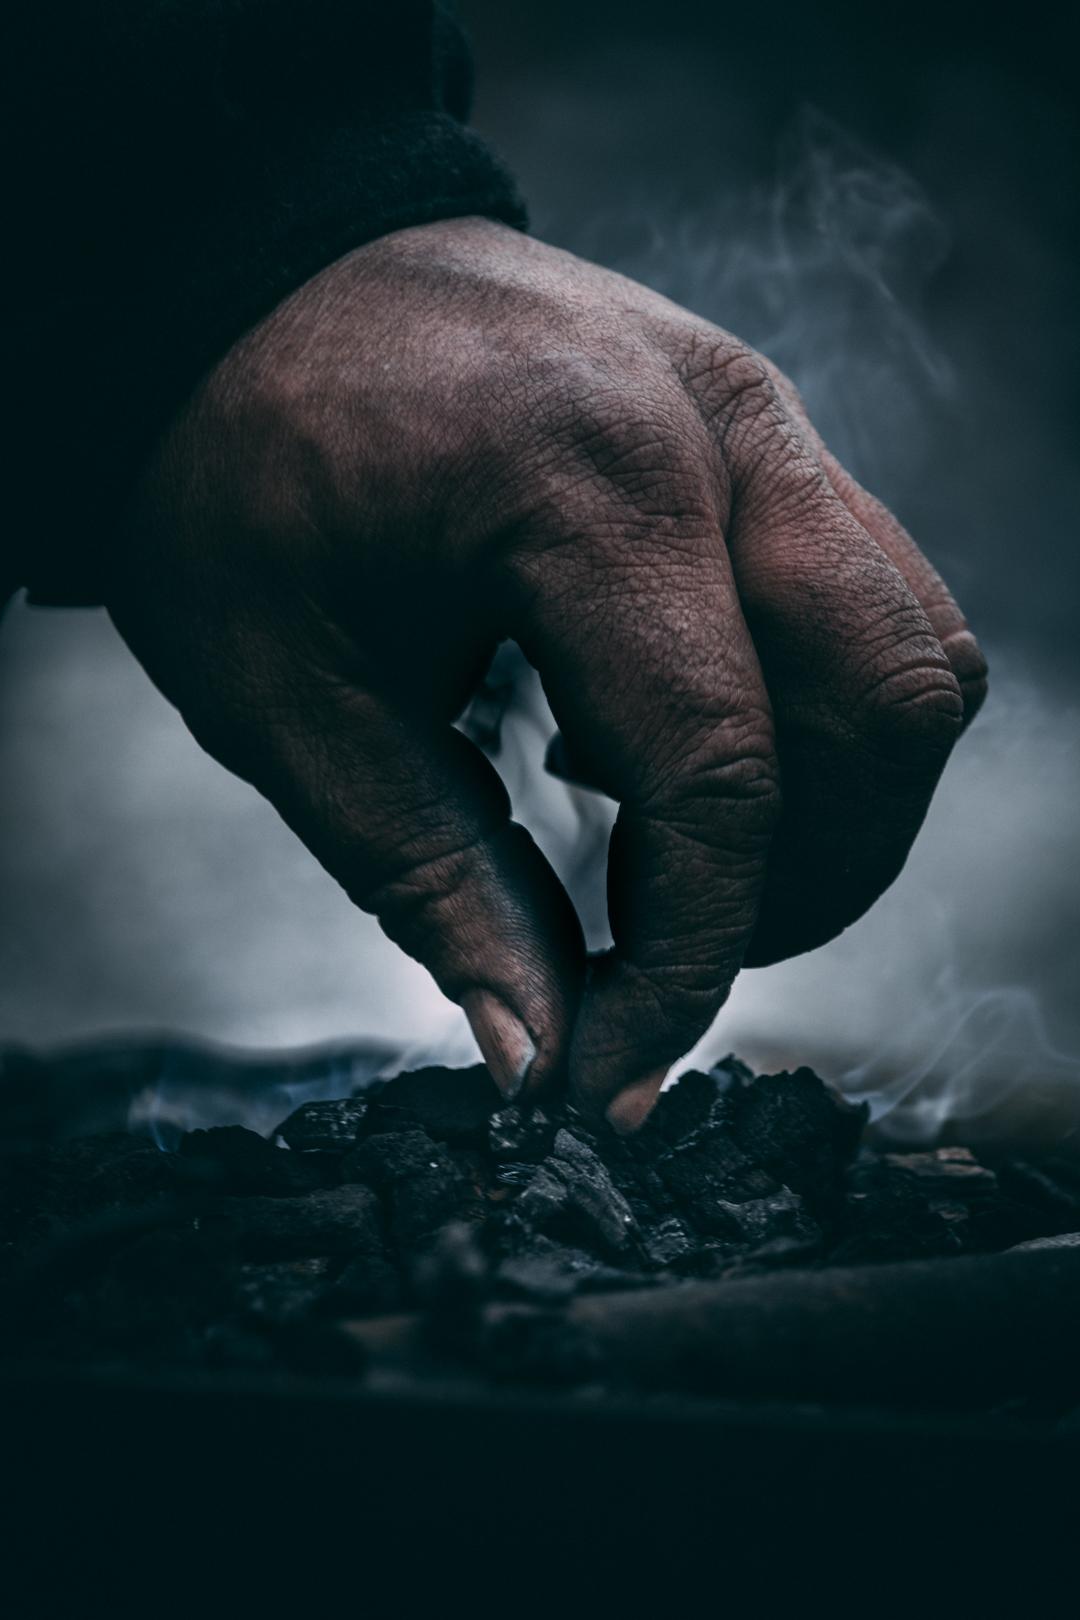 blacksmith-17.jpg